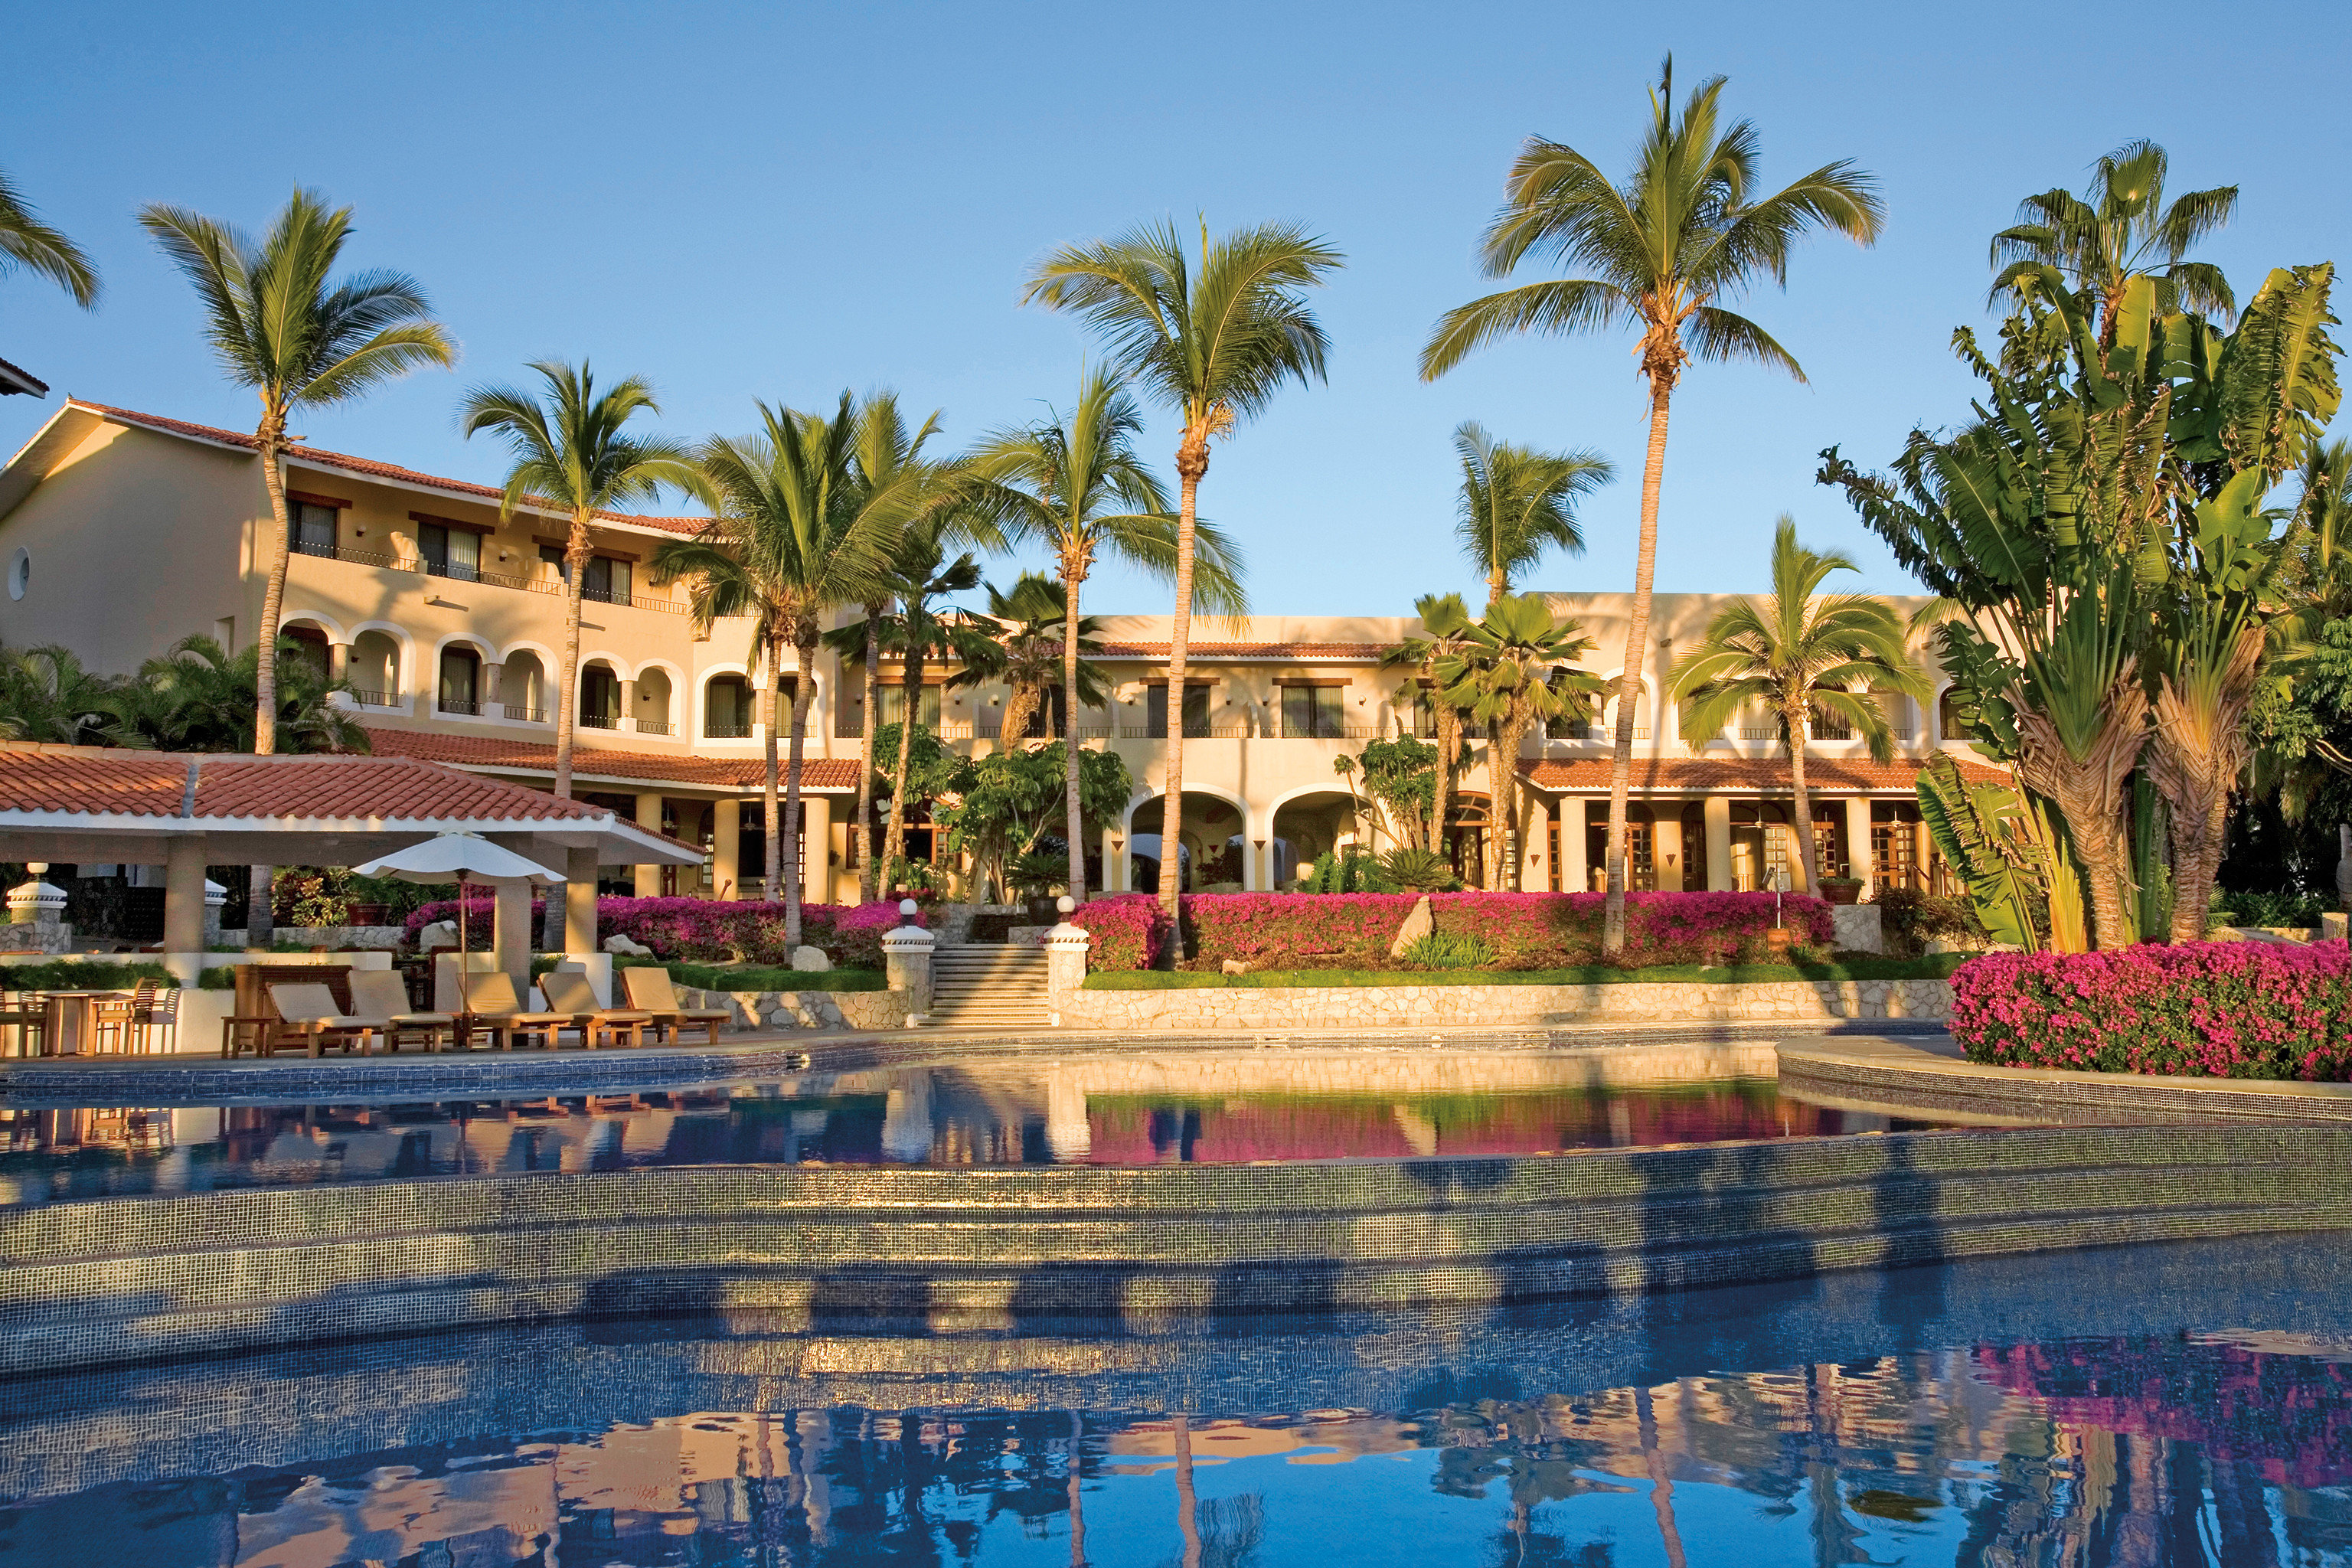 Elegant Lounge Luxury Pool sky tree leisure Resort swimming pool palace palm arecales amusement park park plaza temple